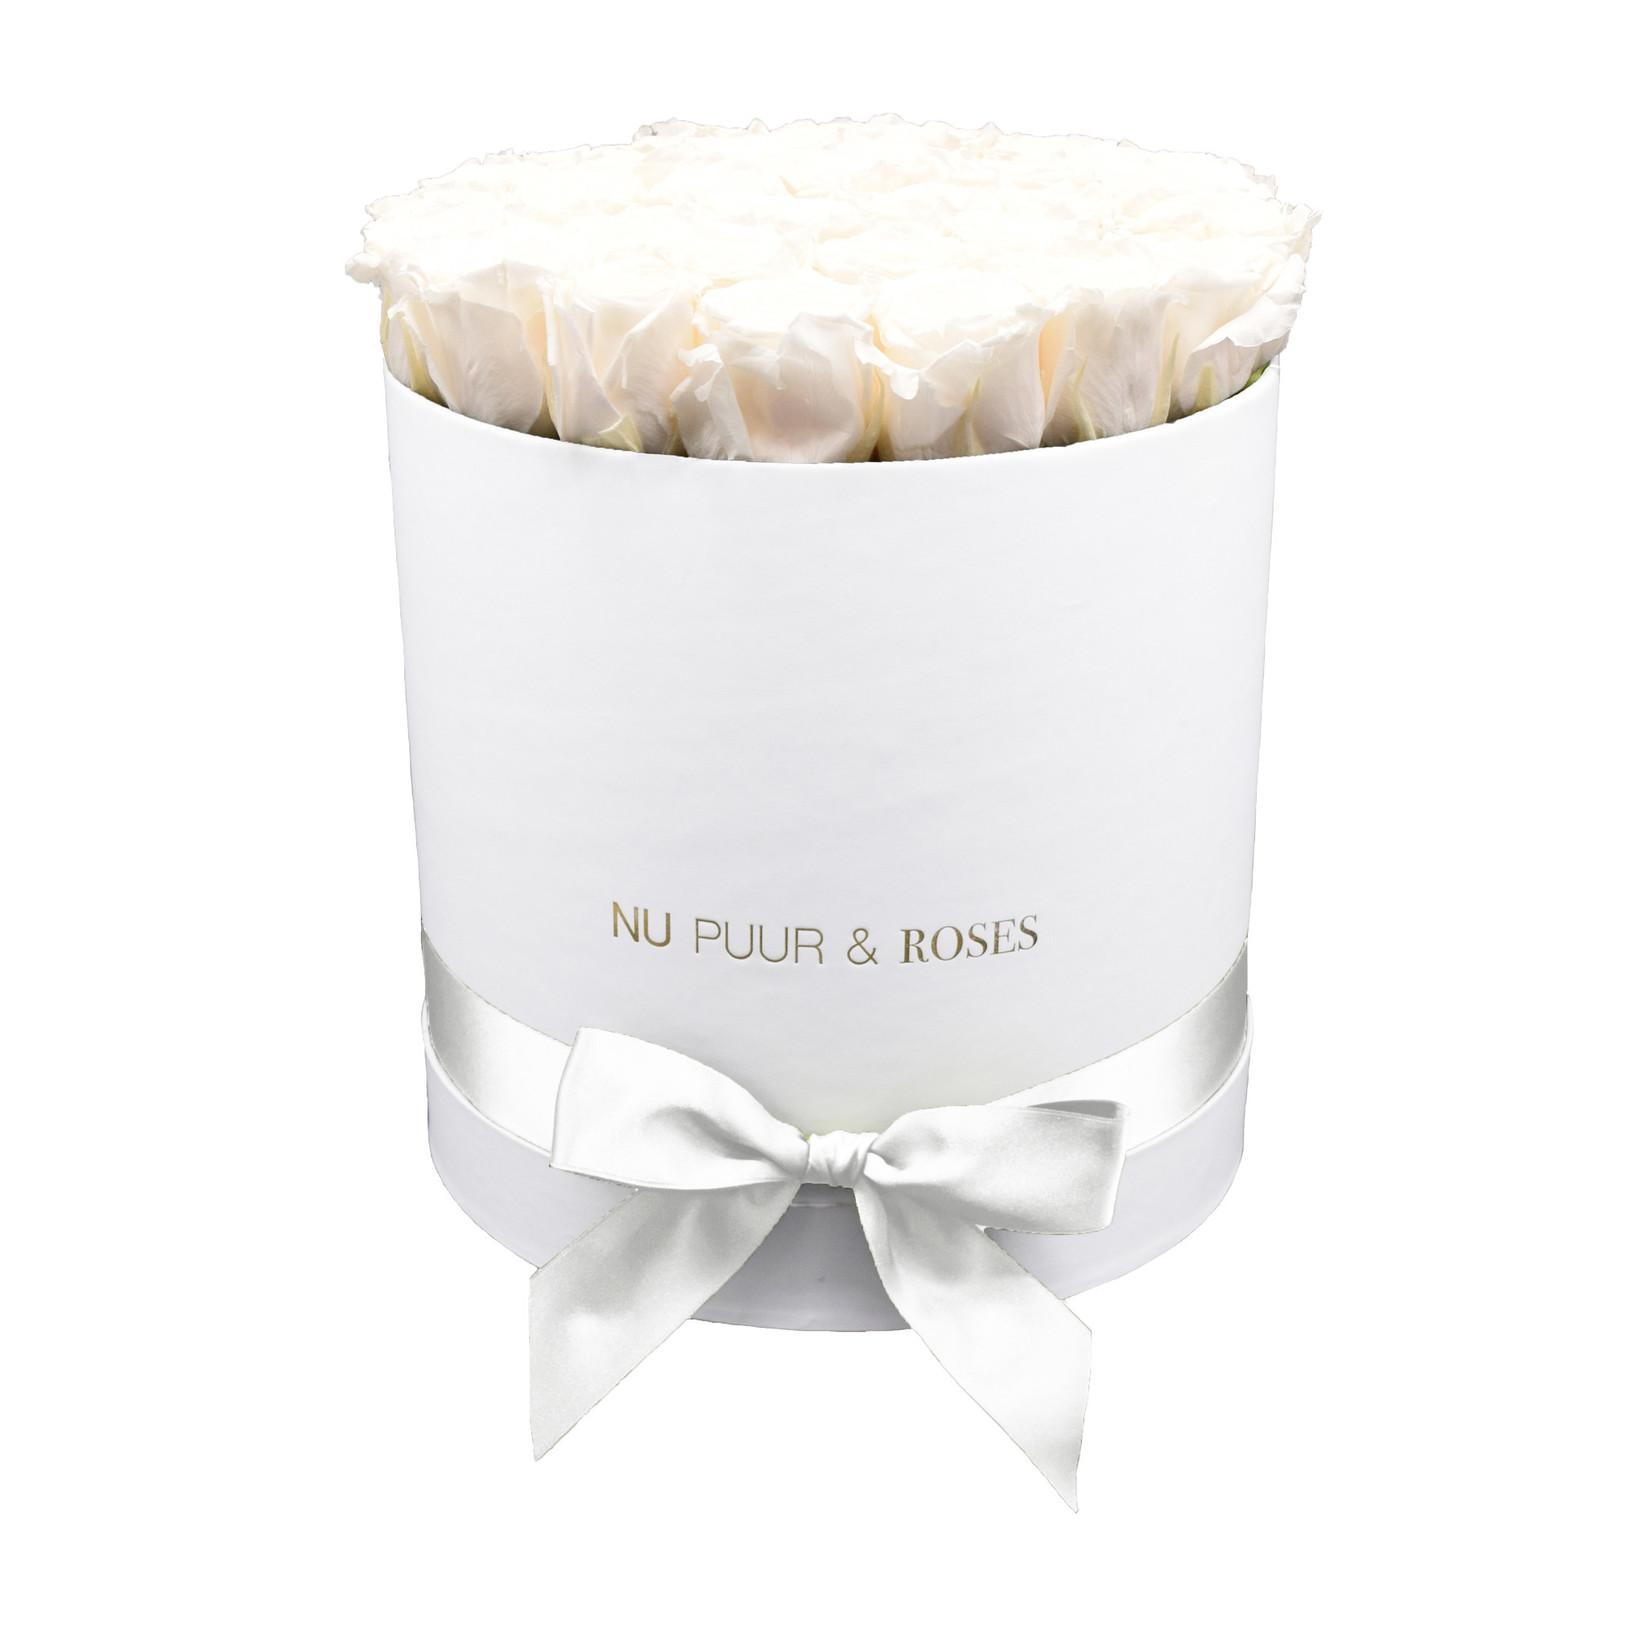 Large - White Endless Roses - White Box